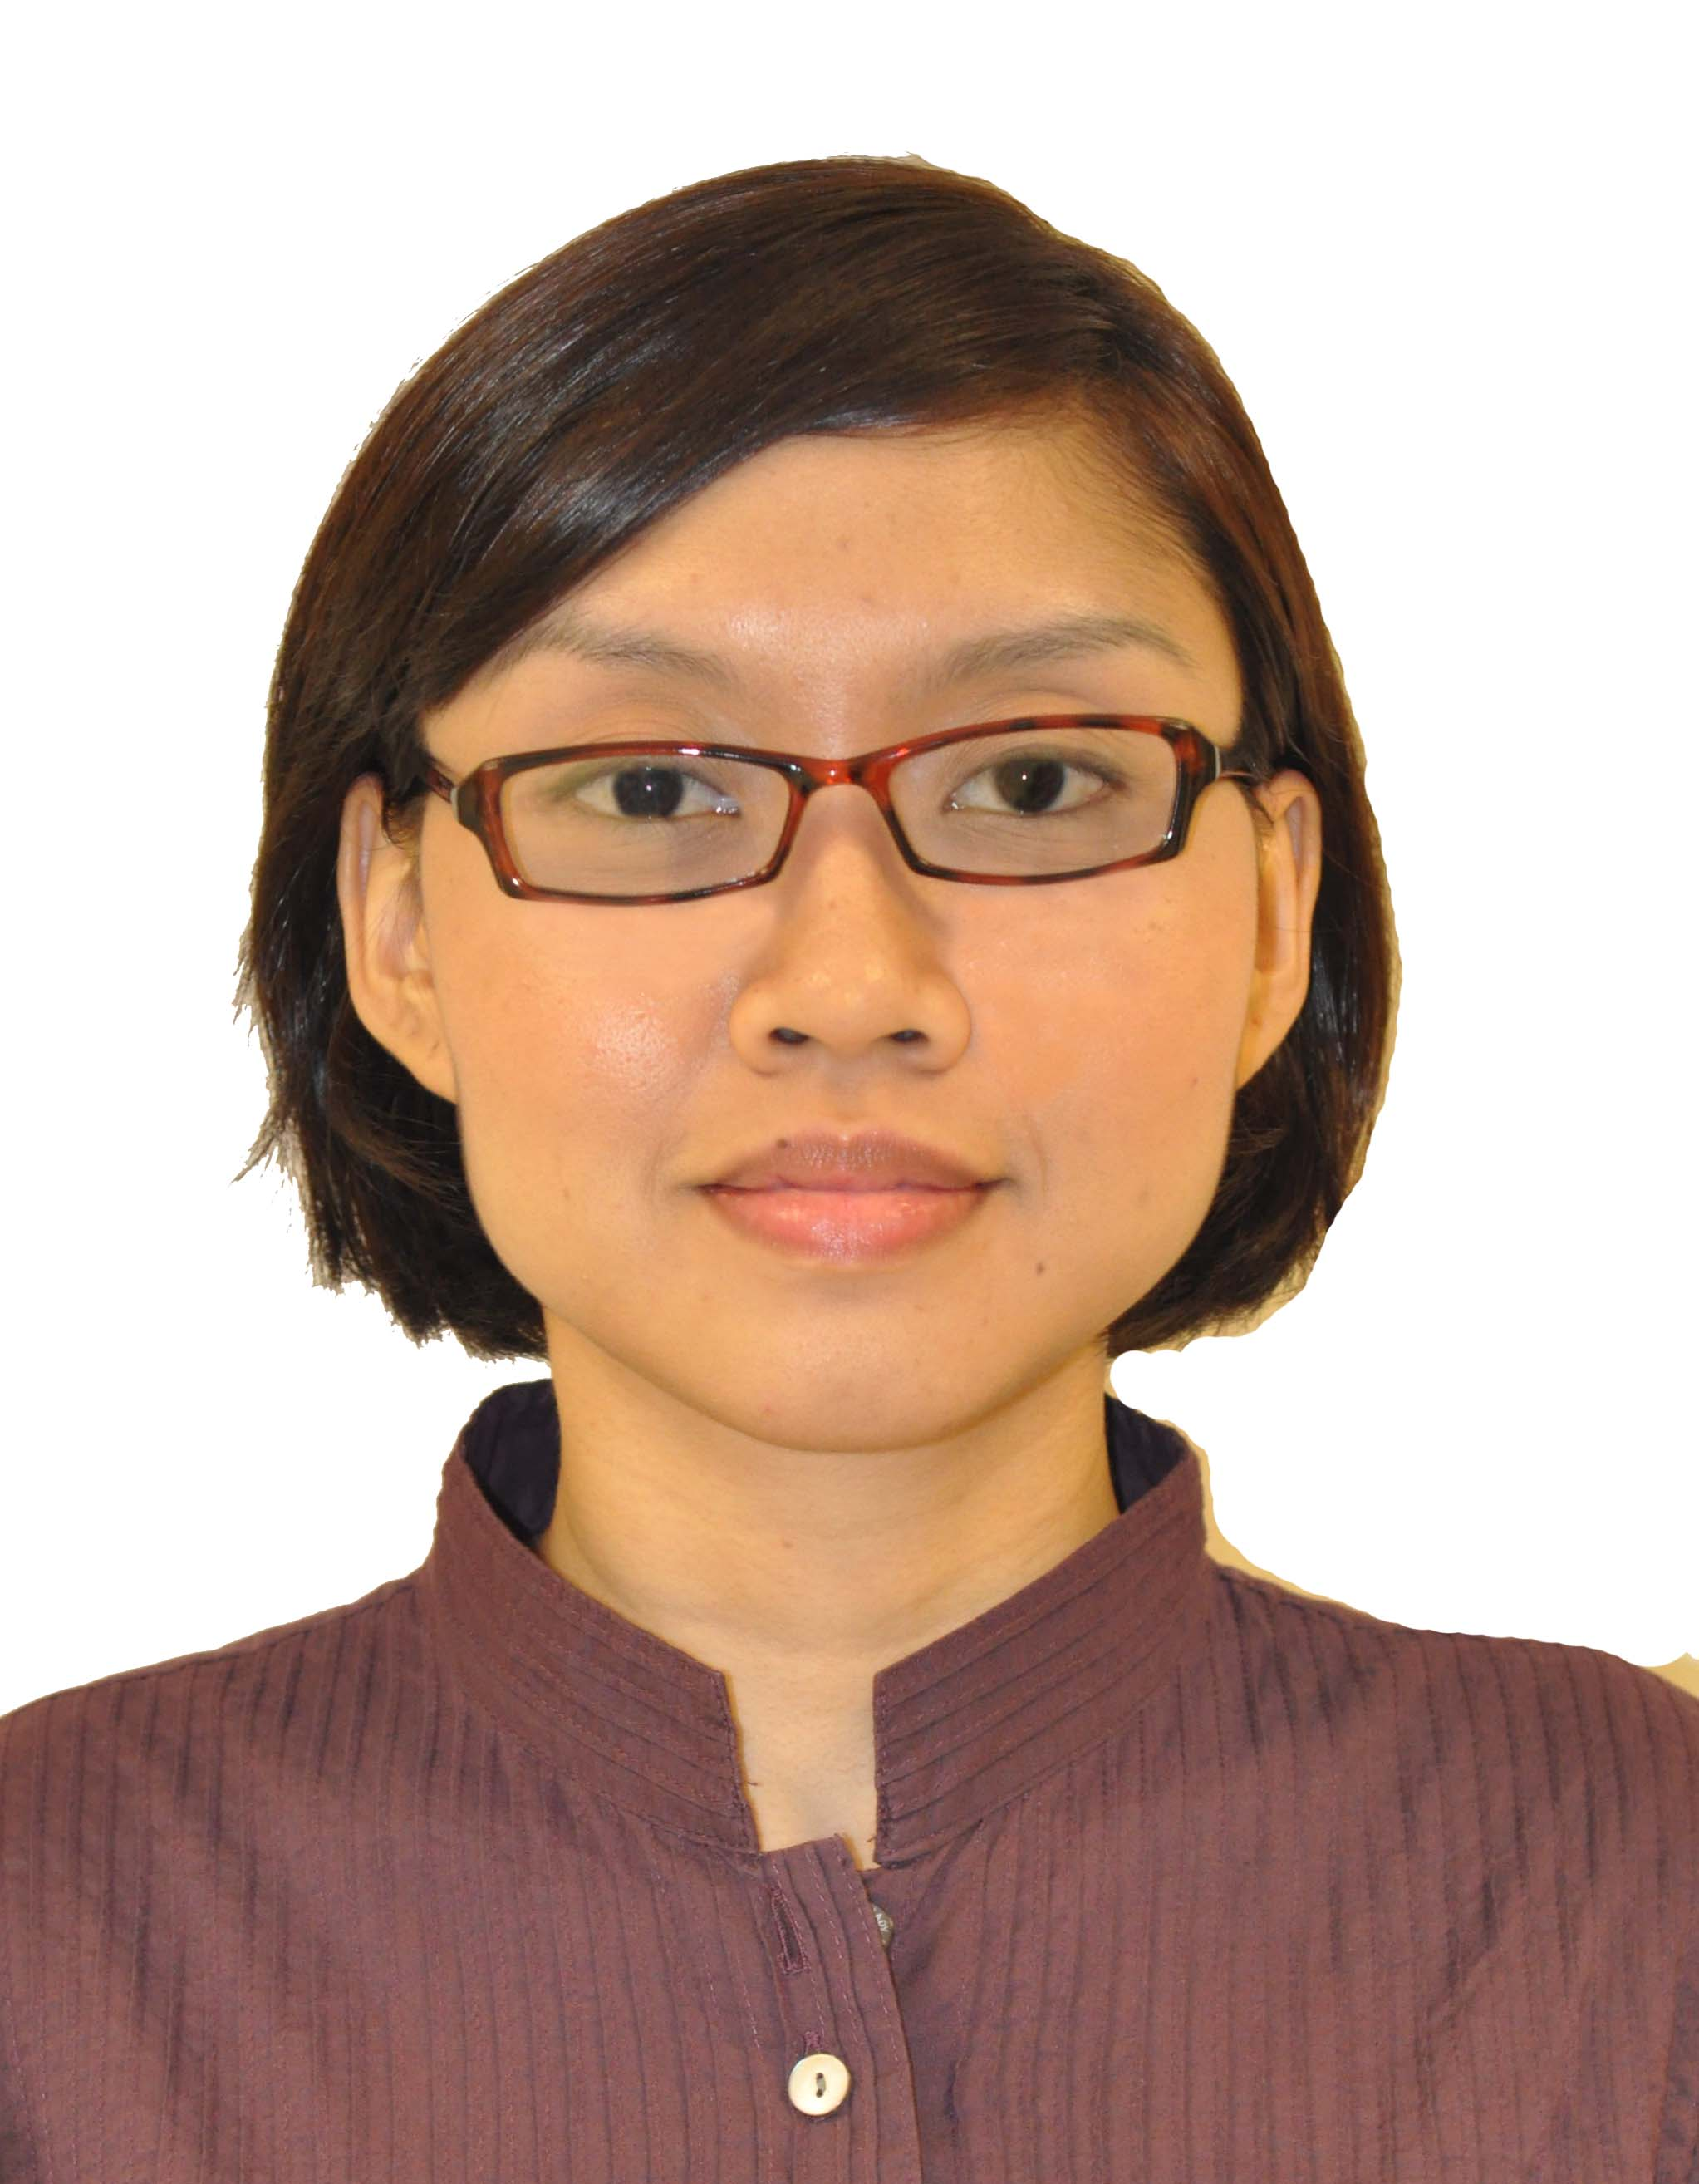 Singapore passport photo